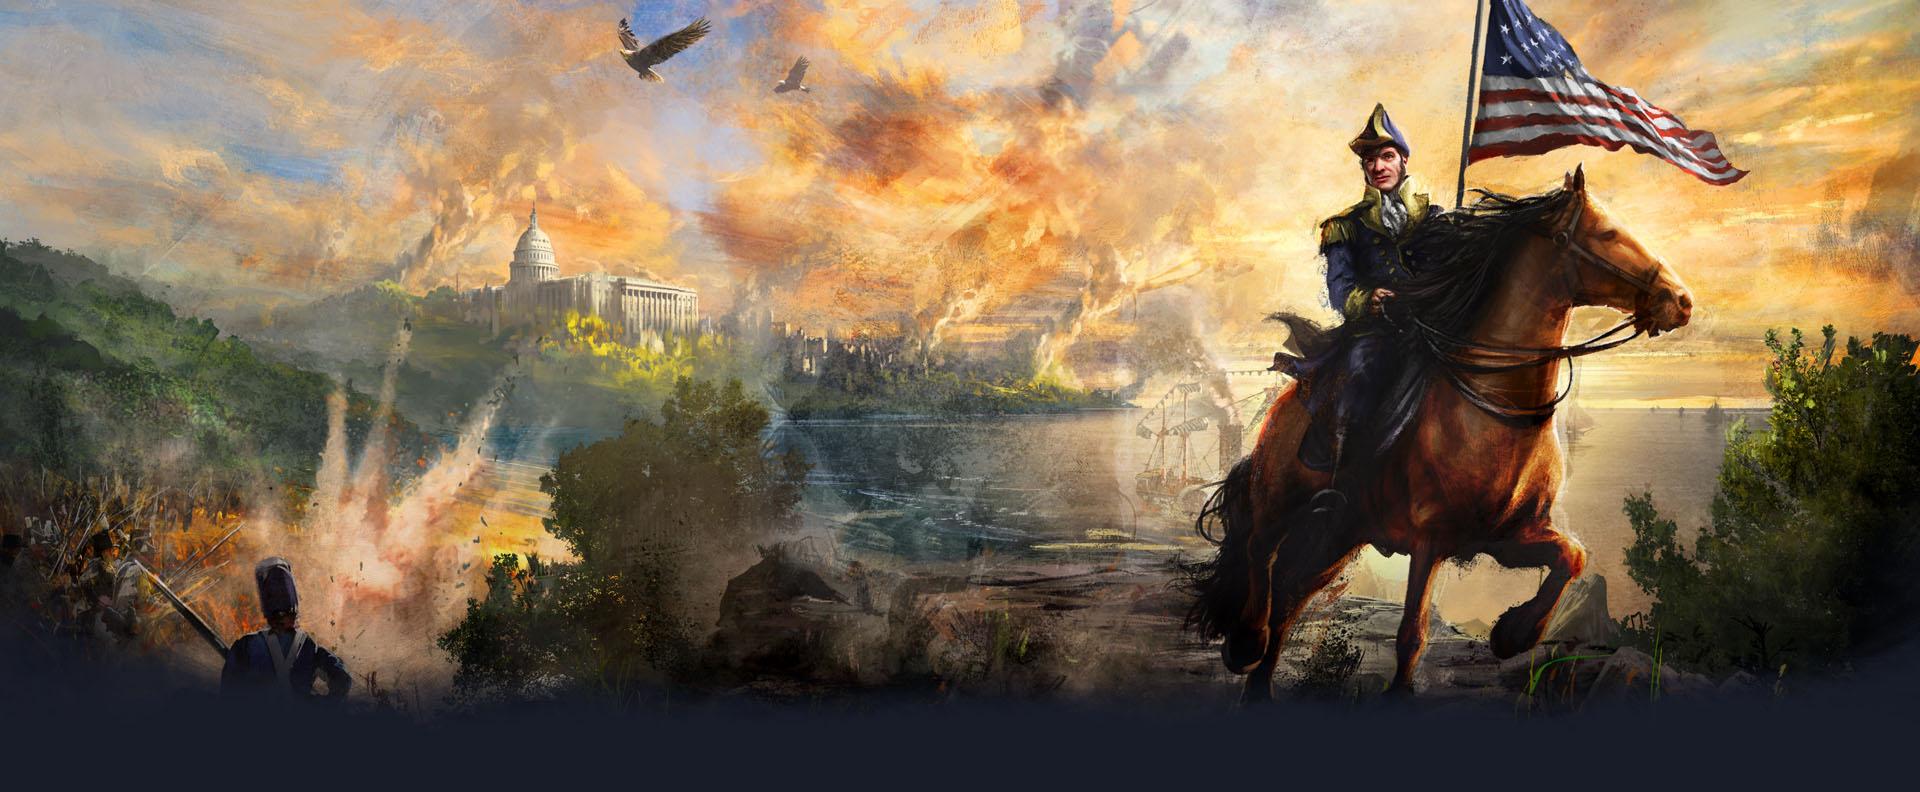 Age of Empires III: Definitive Edition – United States Civilization addon